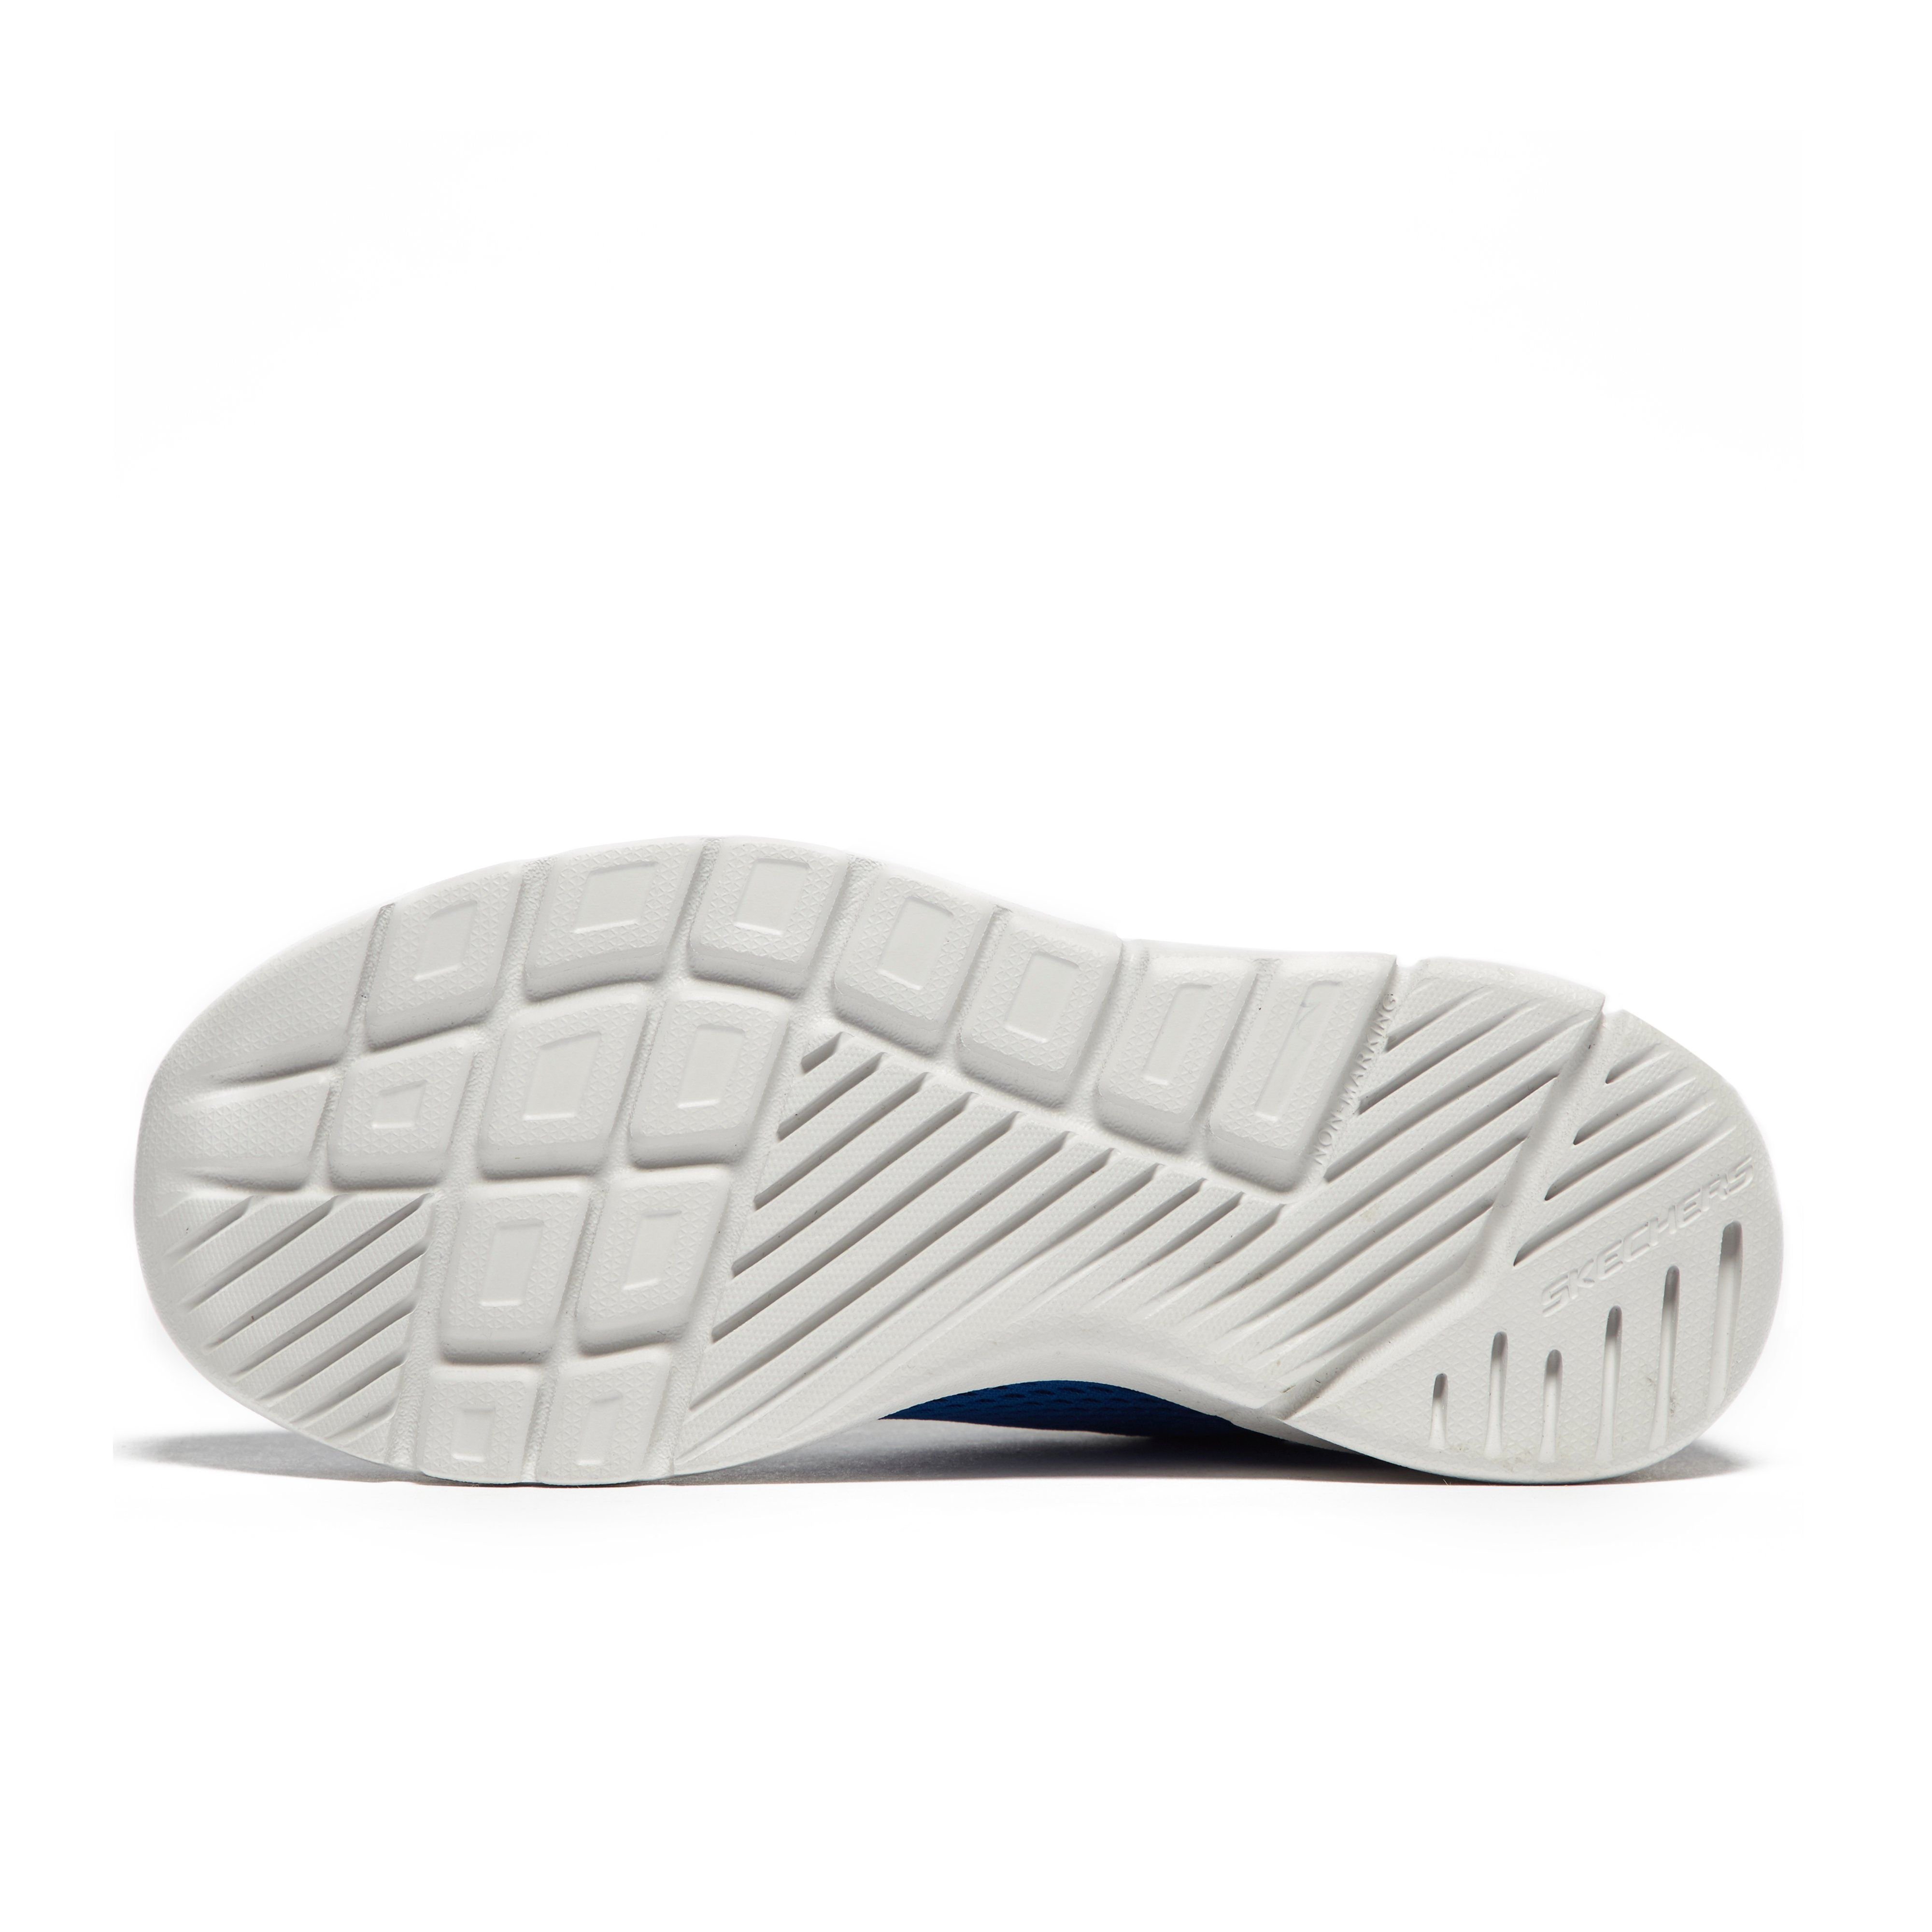 Skechers Equalizer 3.0 Junior Training Shoes